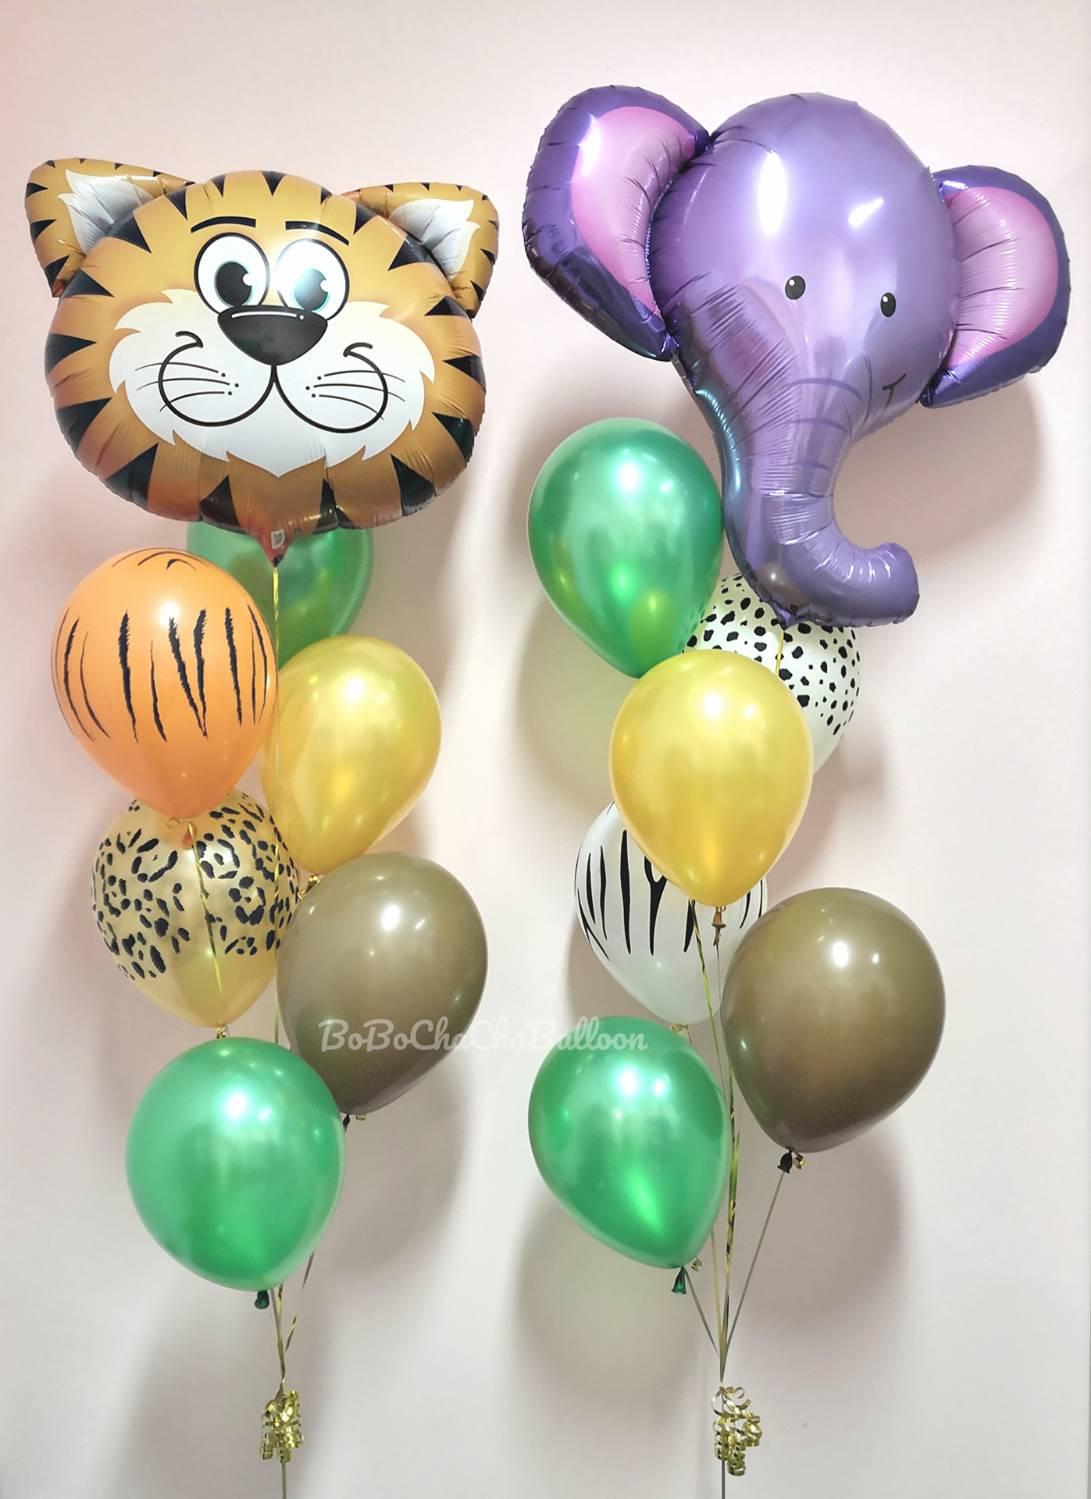 [Animal] 39inch Safari Animal Foil Balloons - Ellie the Elephant